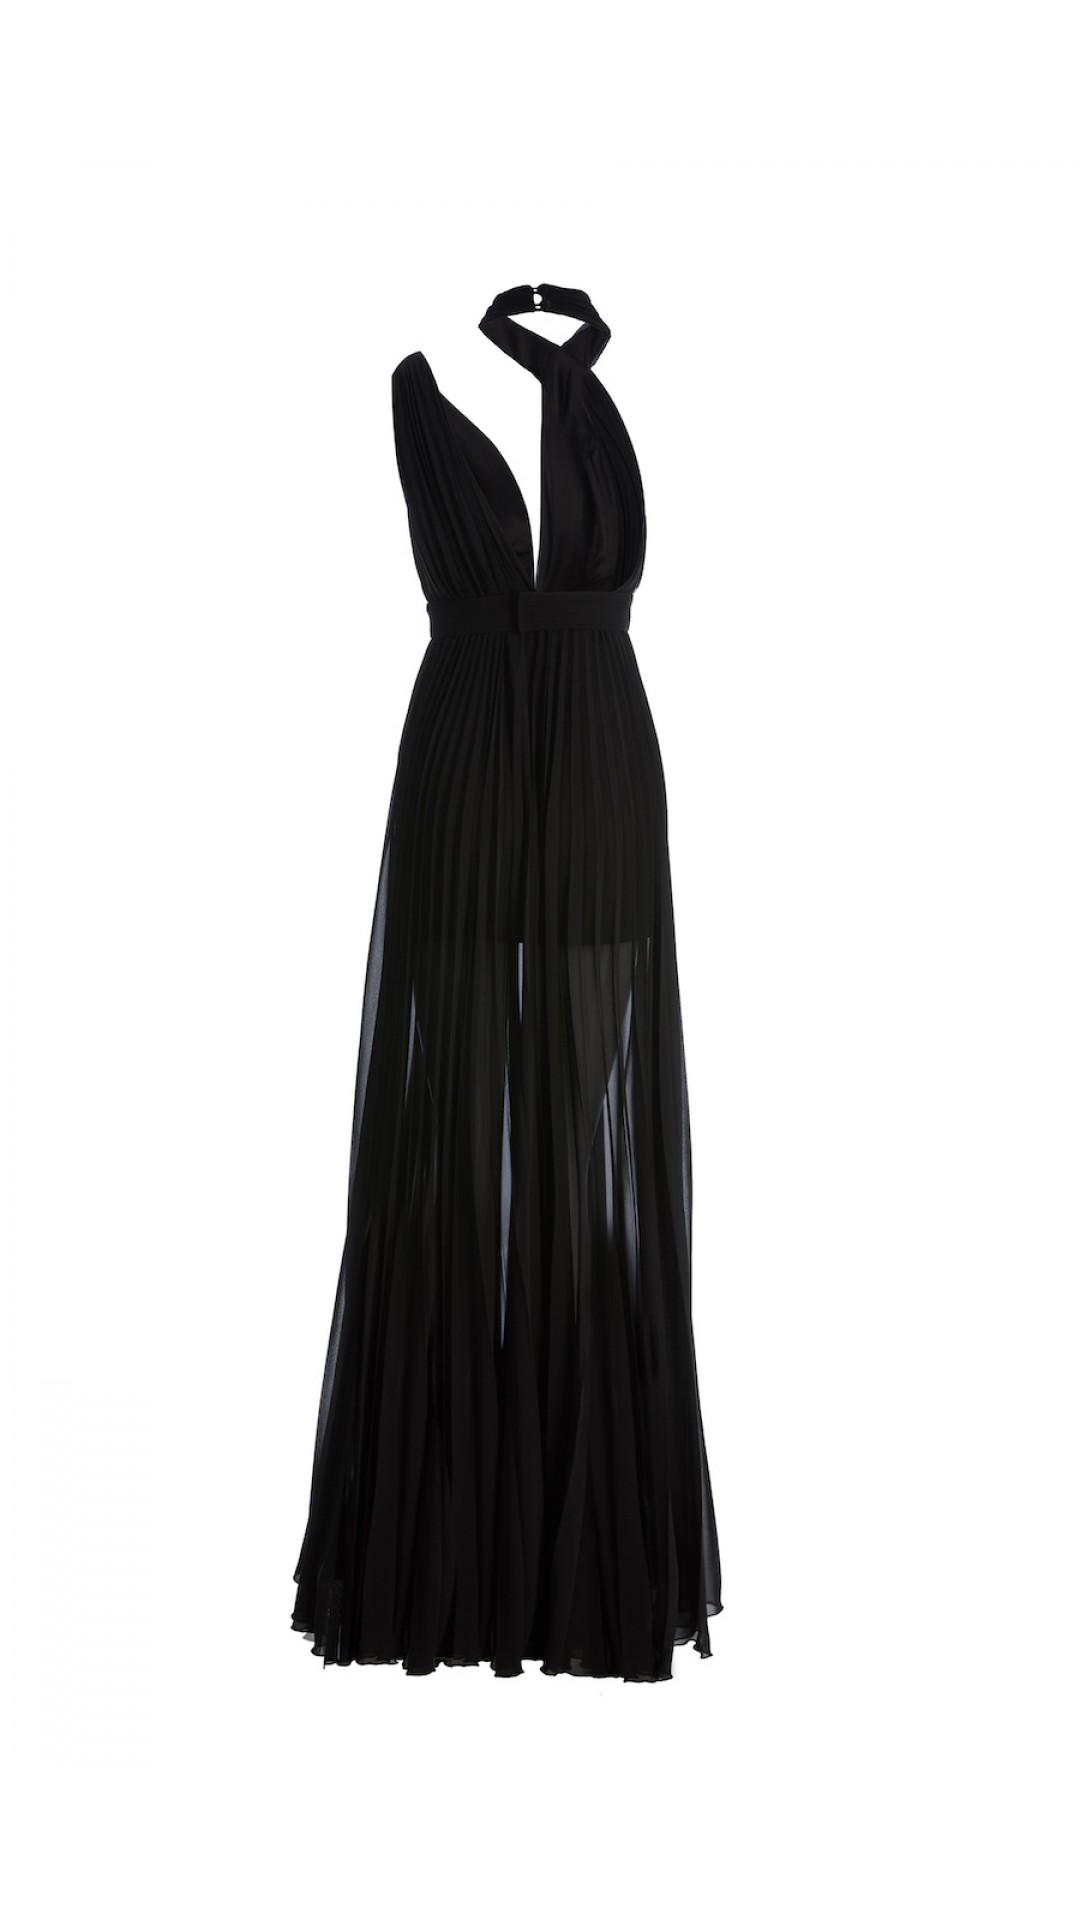 PLEATED BLACK NIGHT DRESS